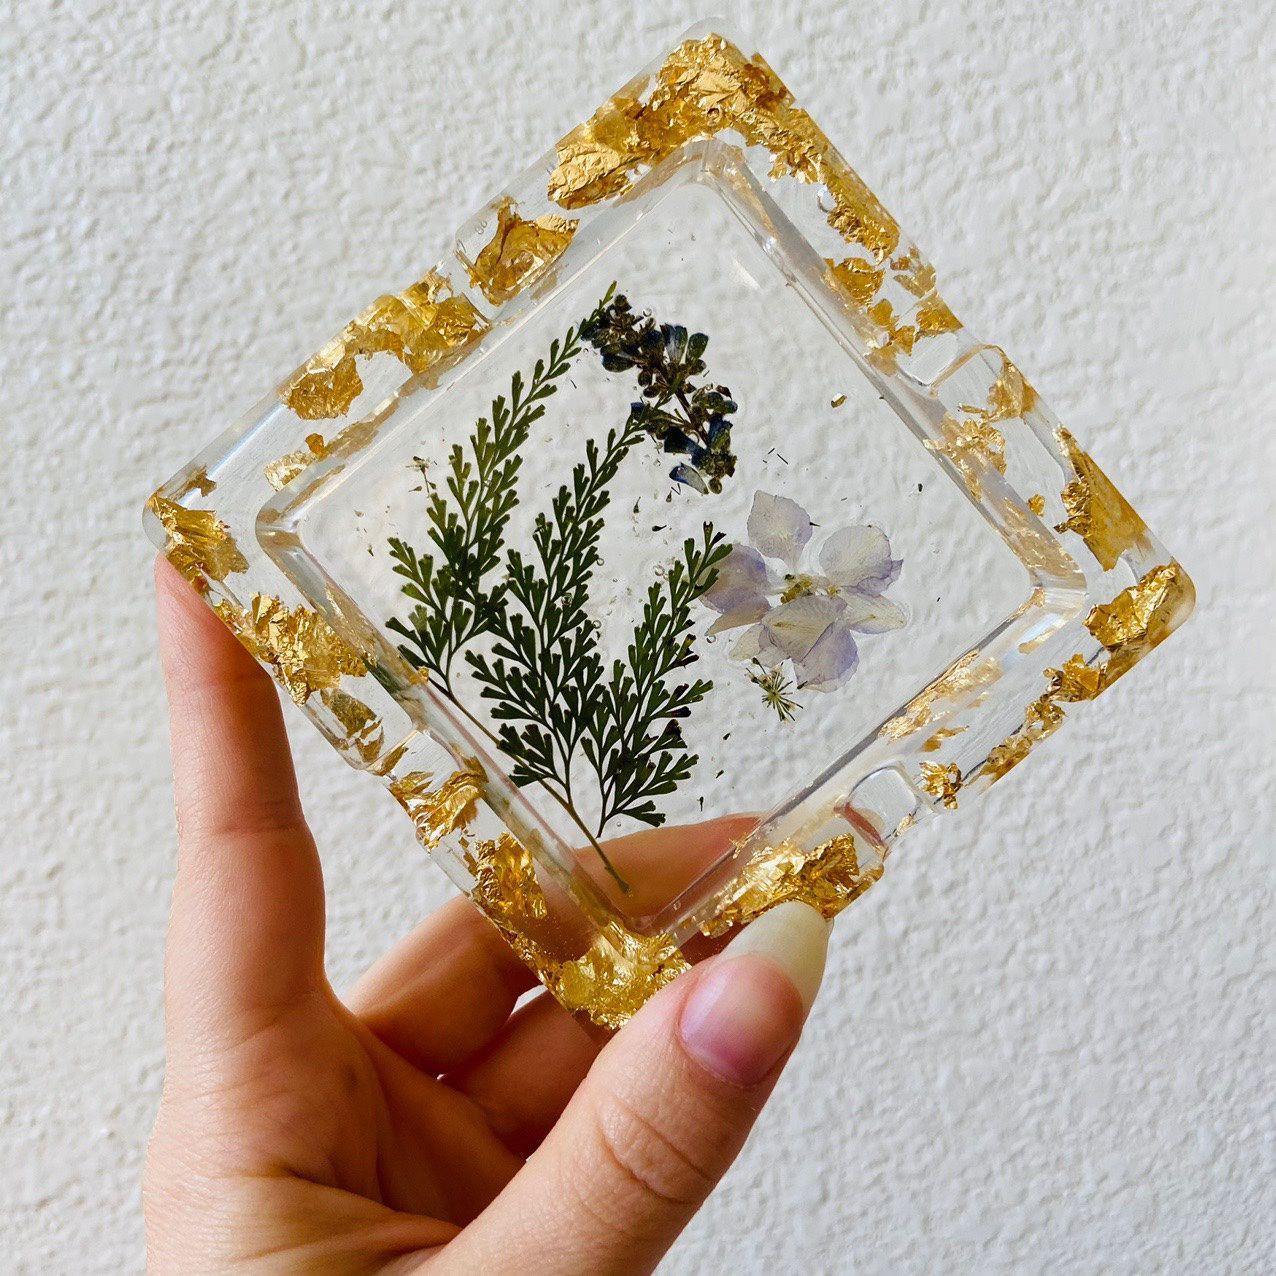 Handmade Pressed Flowers Nature Lilac Gold Resin Ashtray Decor Art Mold